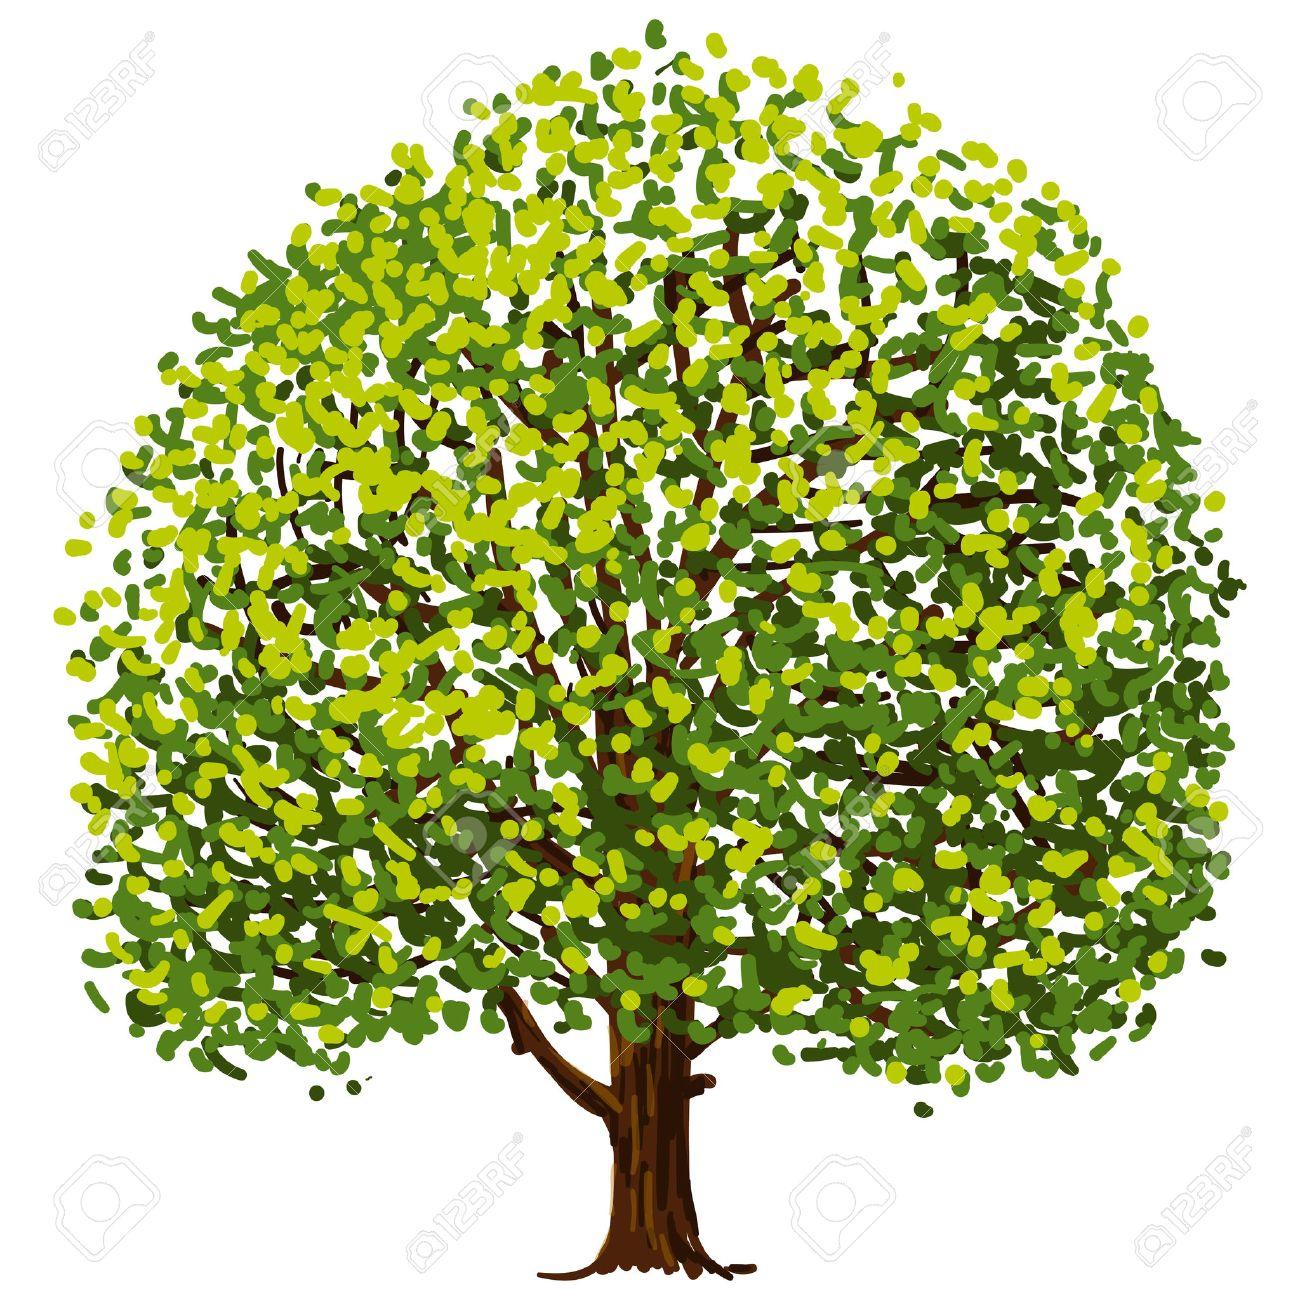 oak tree drawing stock photos u0026 pictures royalty free oak tree